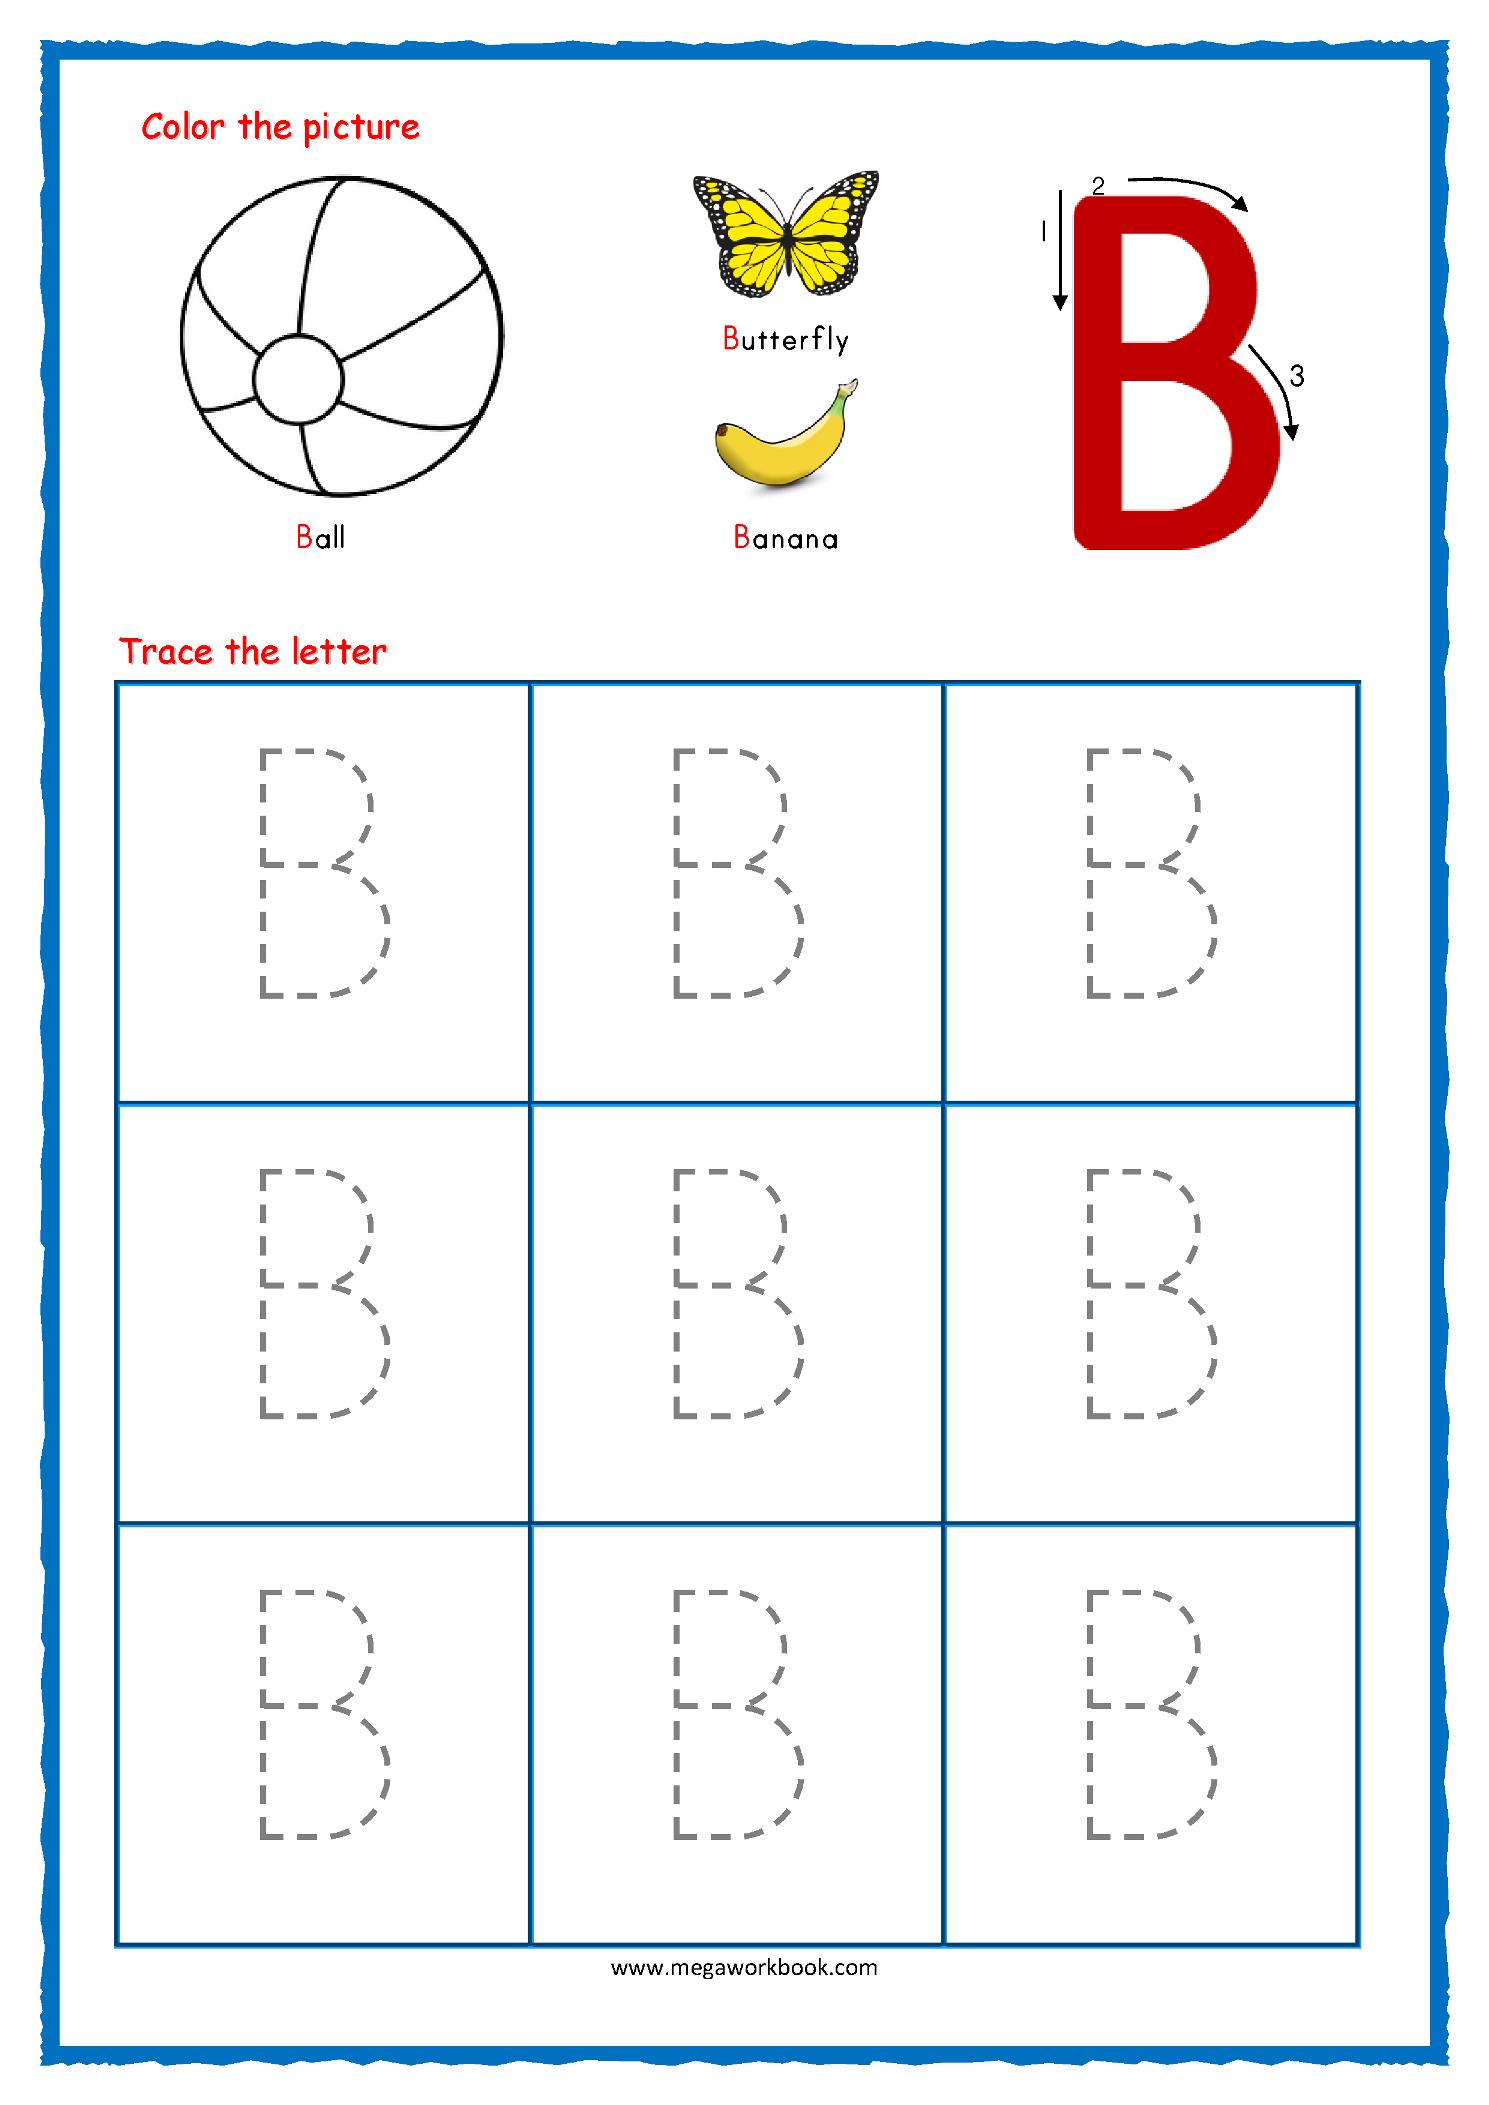 Letter Tracing Papers - Wpa.wpart.co inside Tracing Letter I Worksheets For Kindergarten